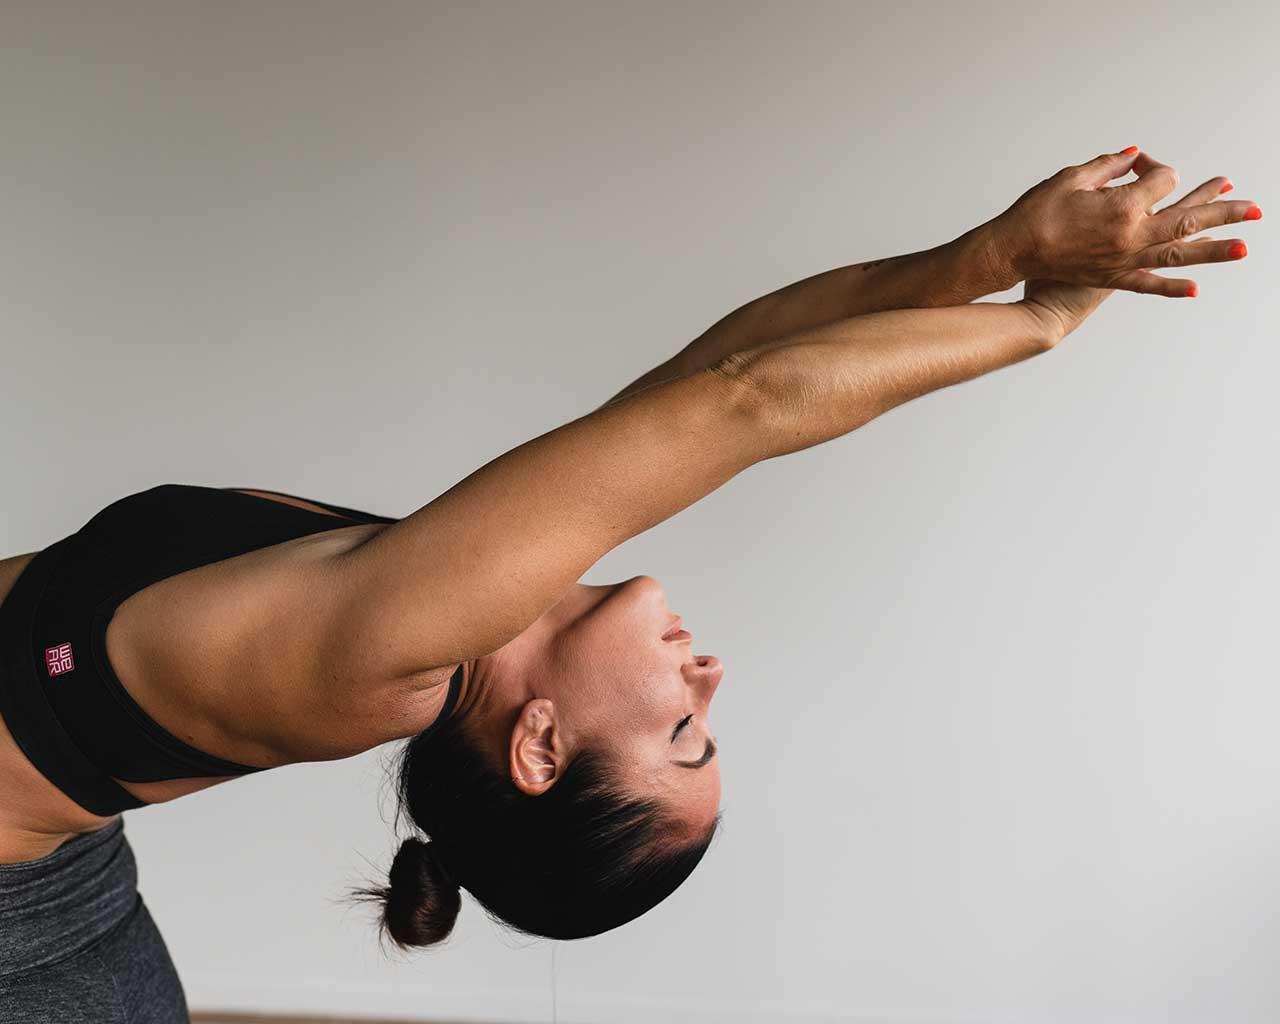 15 Sofort Hilfe Tipps gegen innere Unruhe